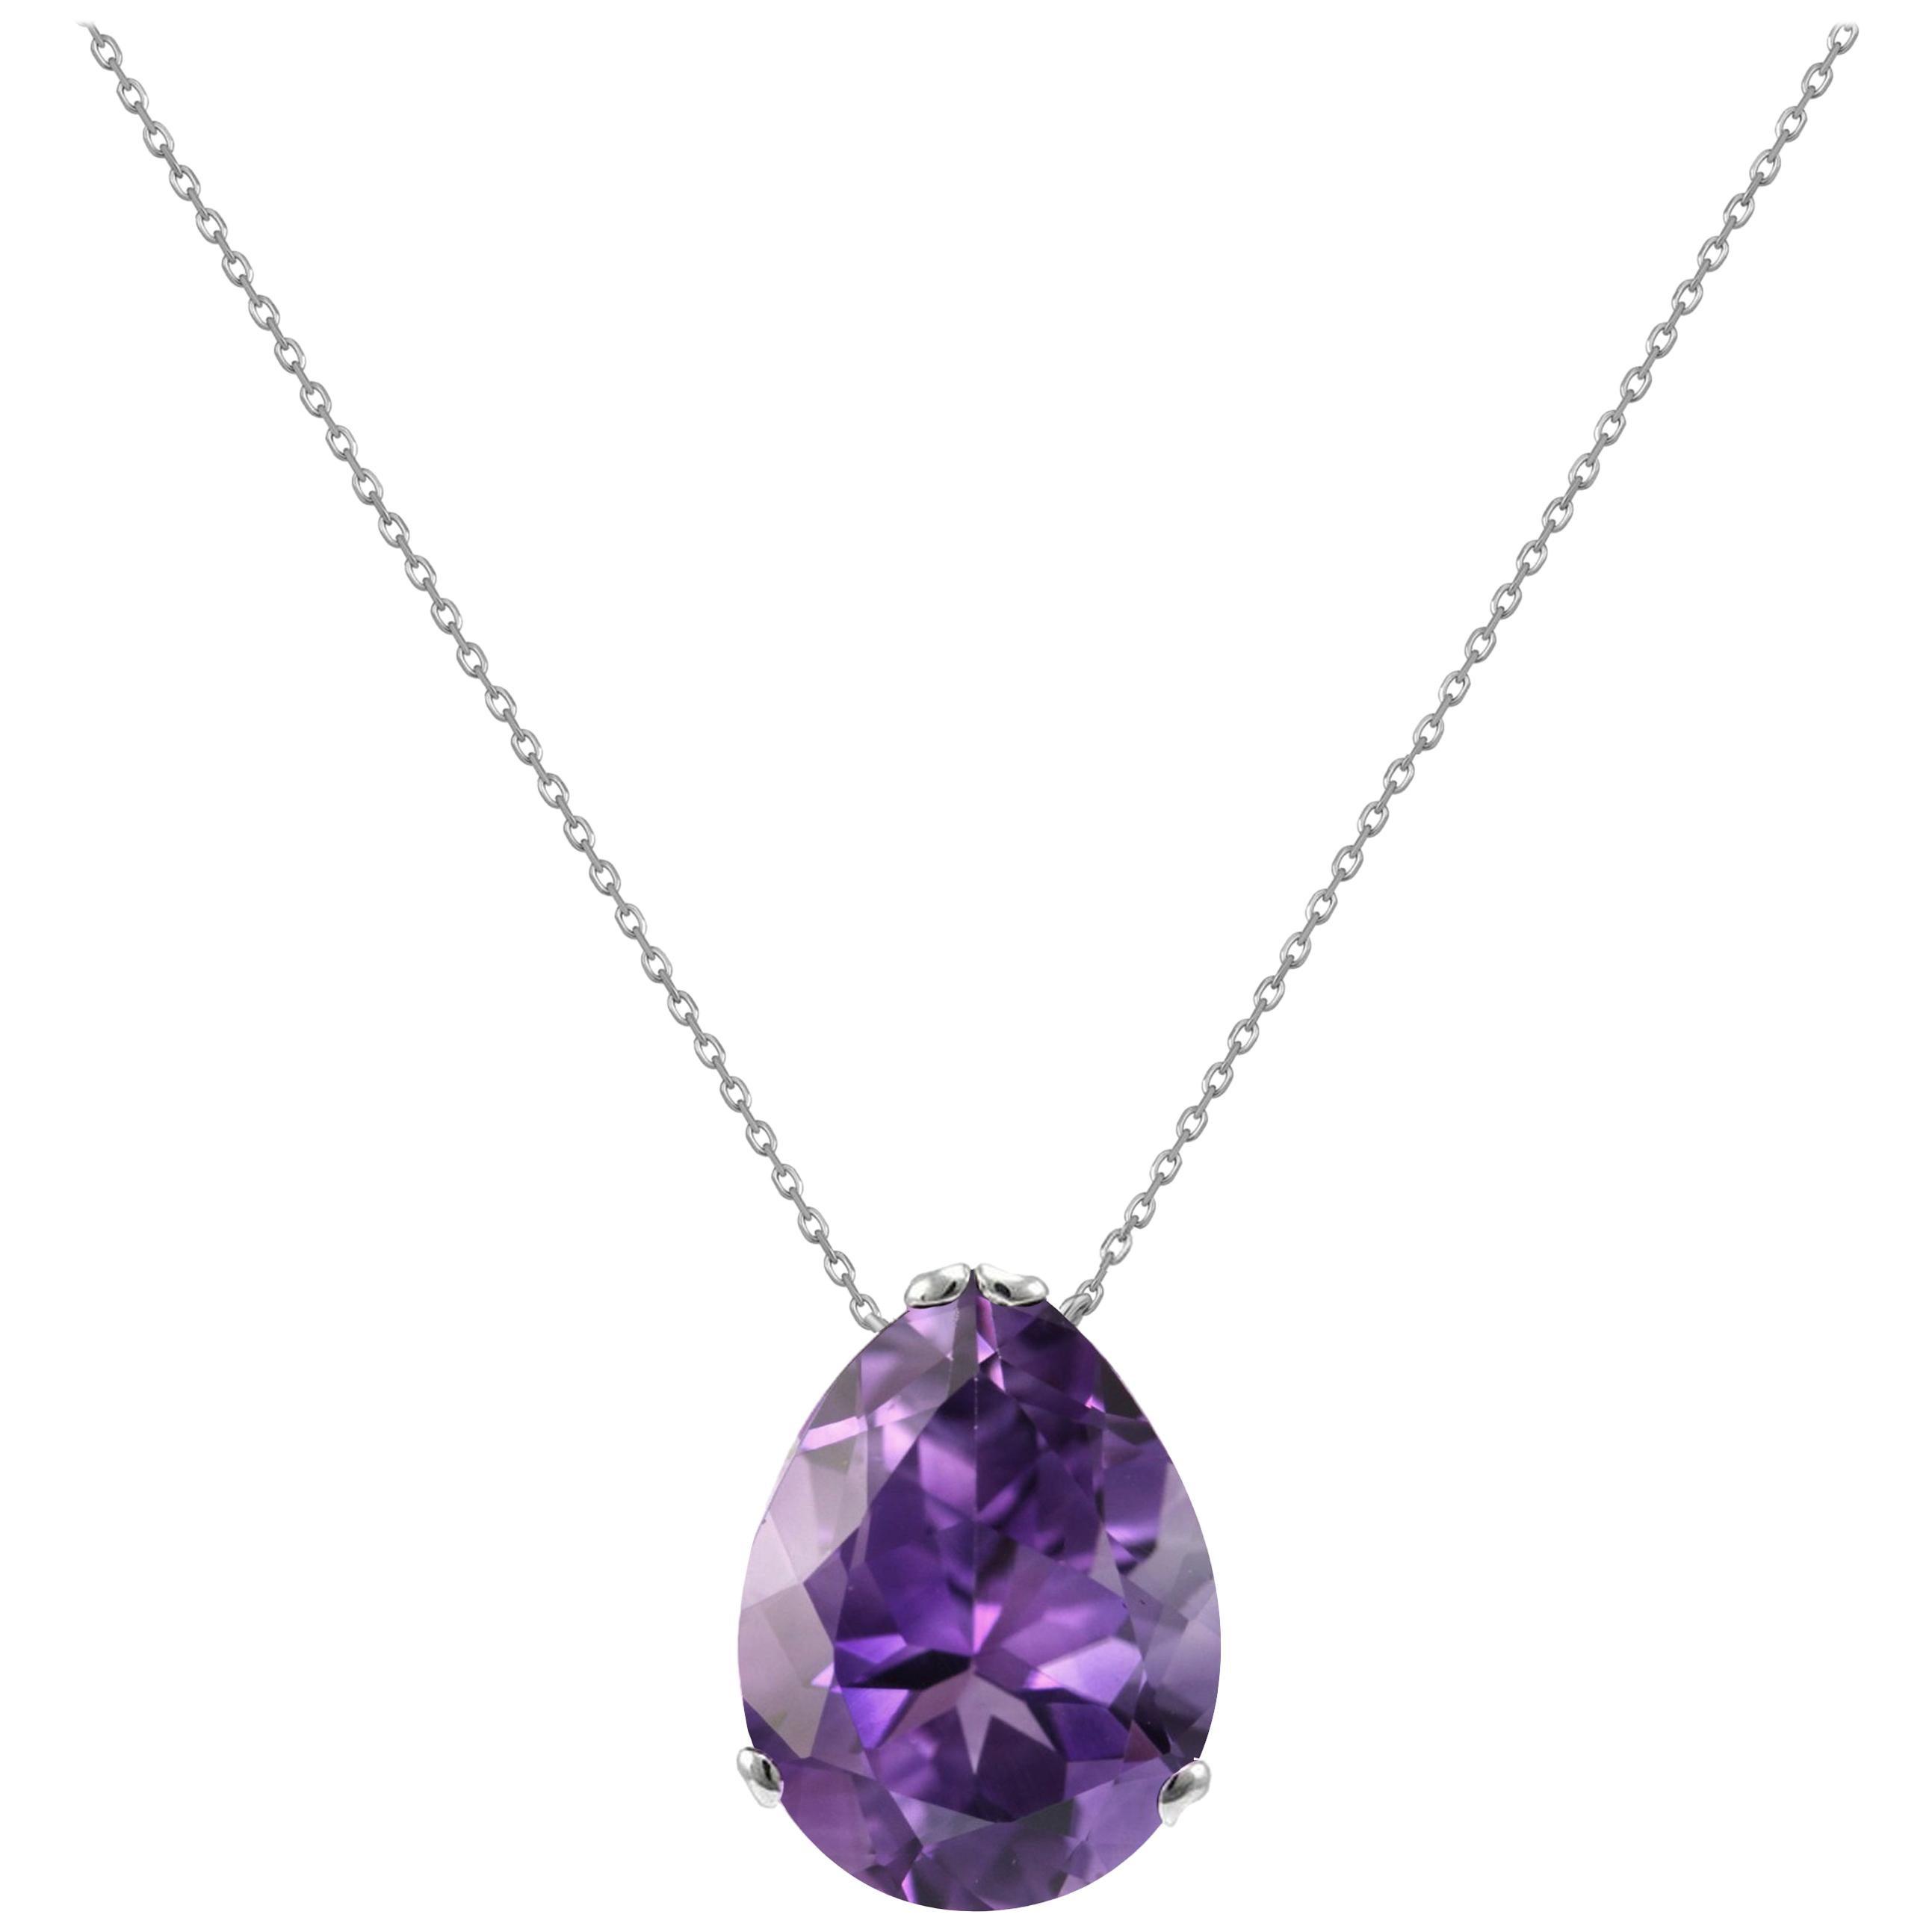 Fei Liu Purple Amethyst 18 Karat Black Gold Egg Pendant Necklace